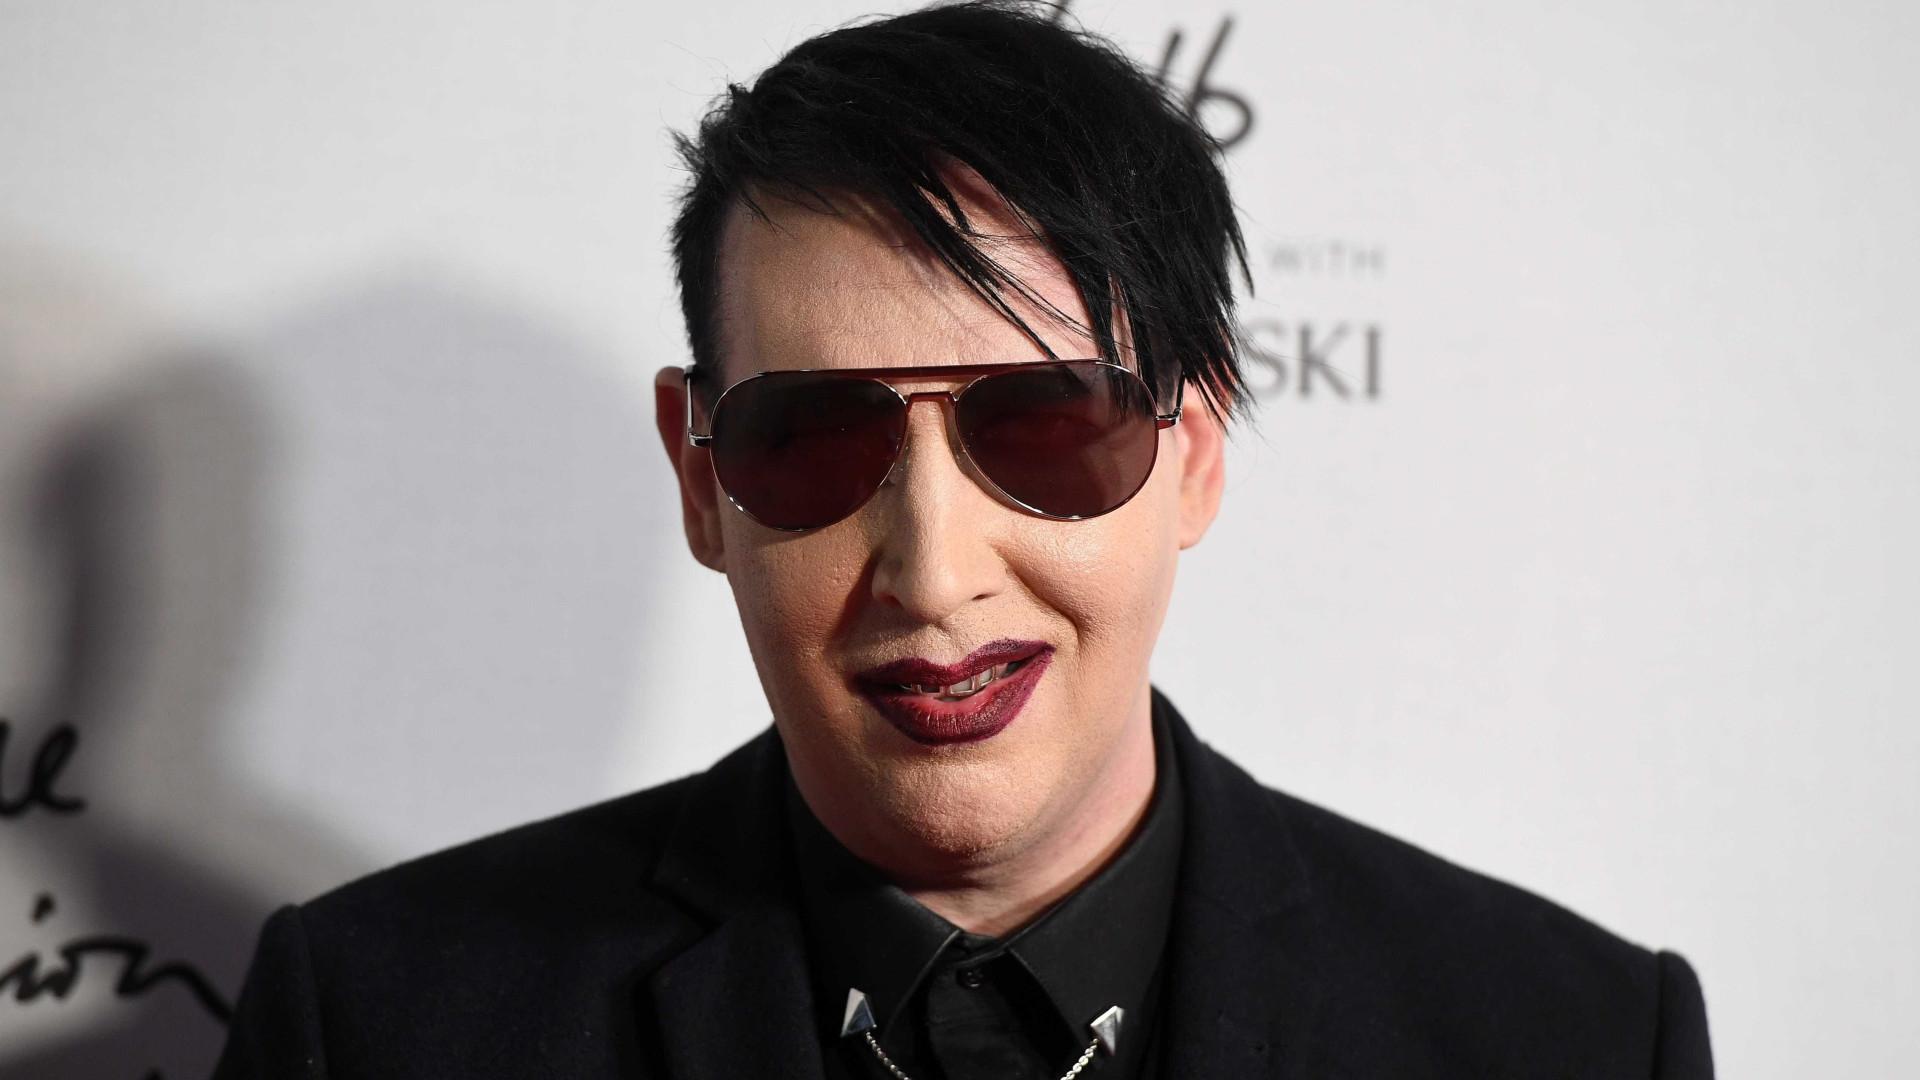 Marilyn Manson ferido durante concerto em Nova Iorque